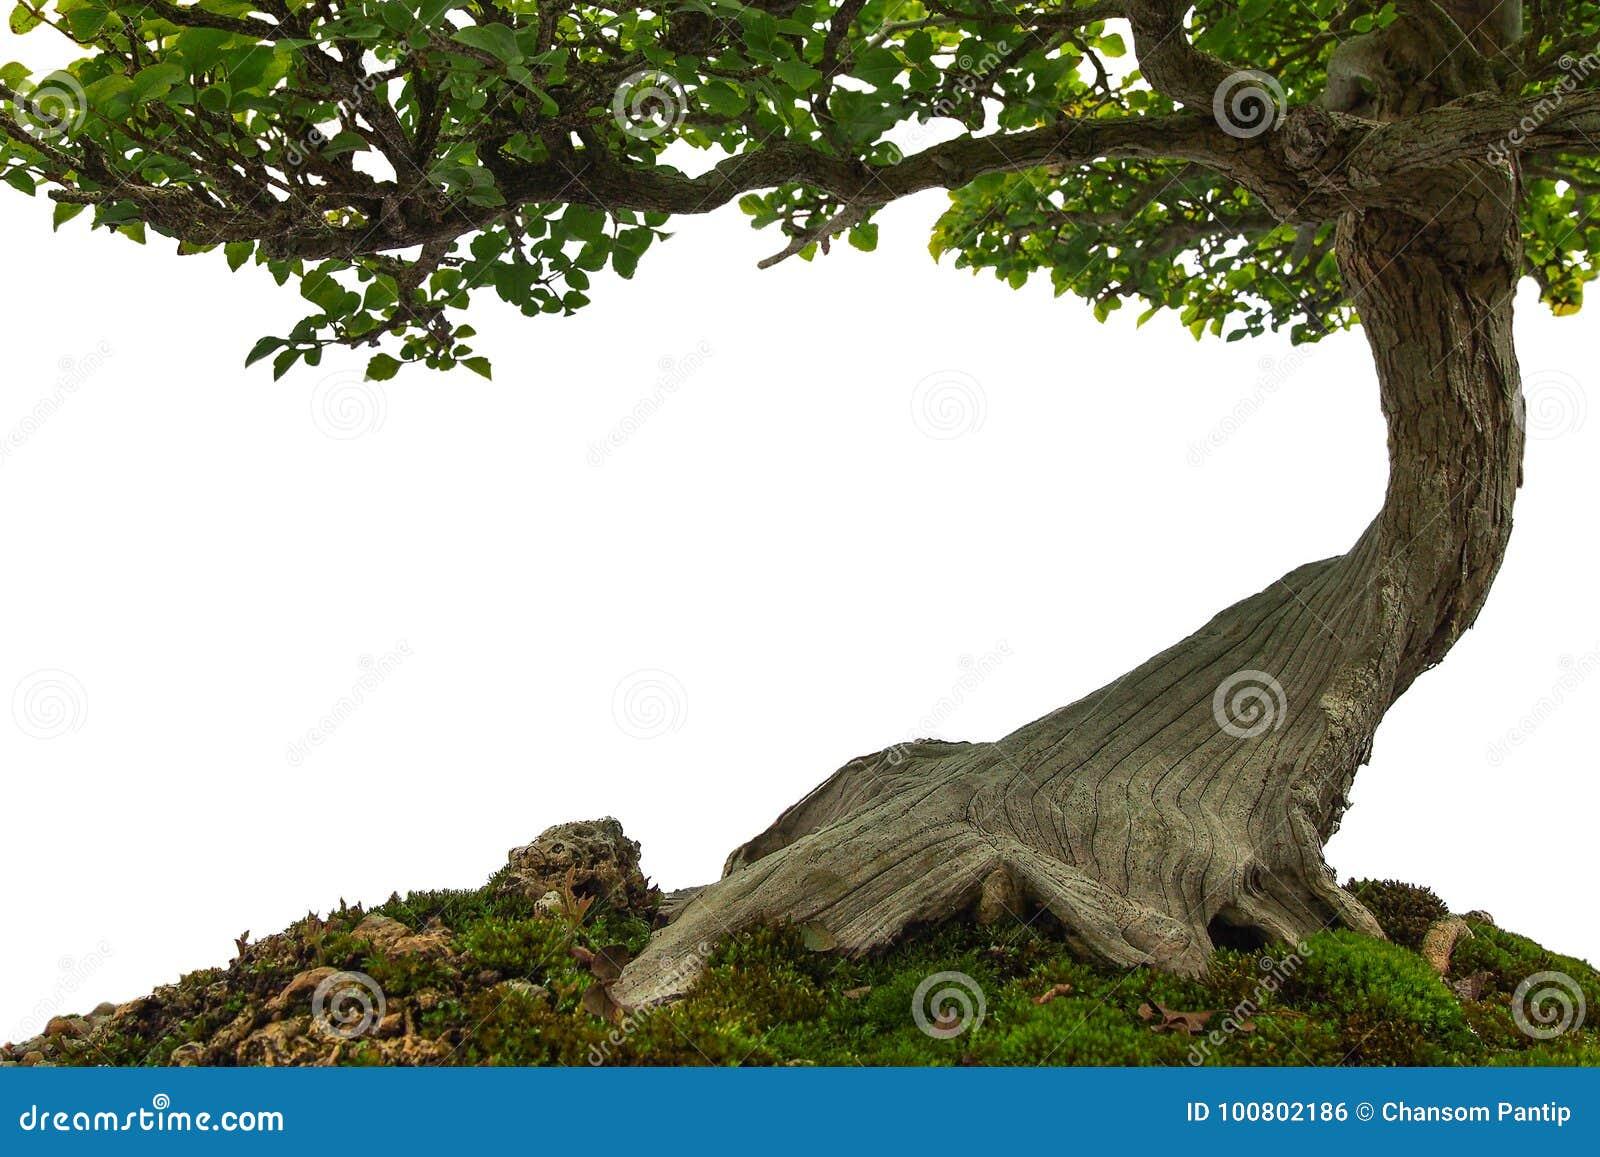 Tree Trunk On Moss Covered Ground Miniature Bonsai Tree On